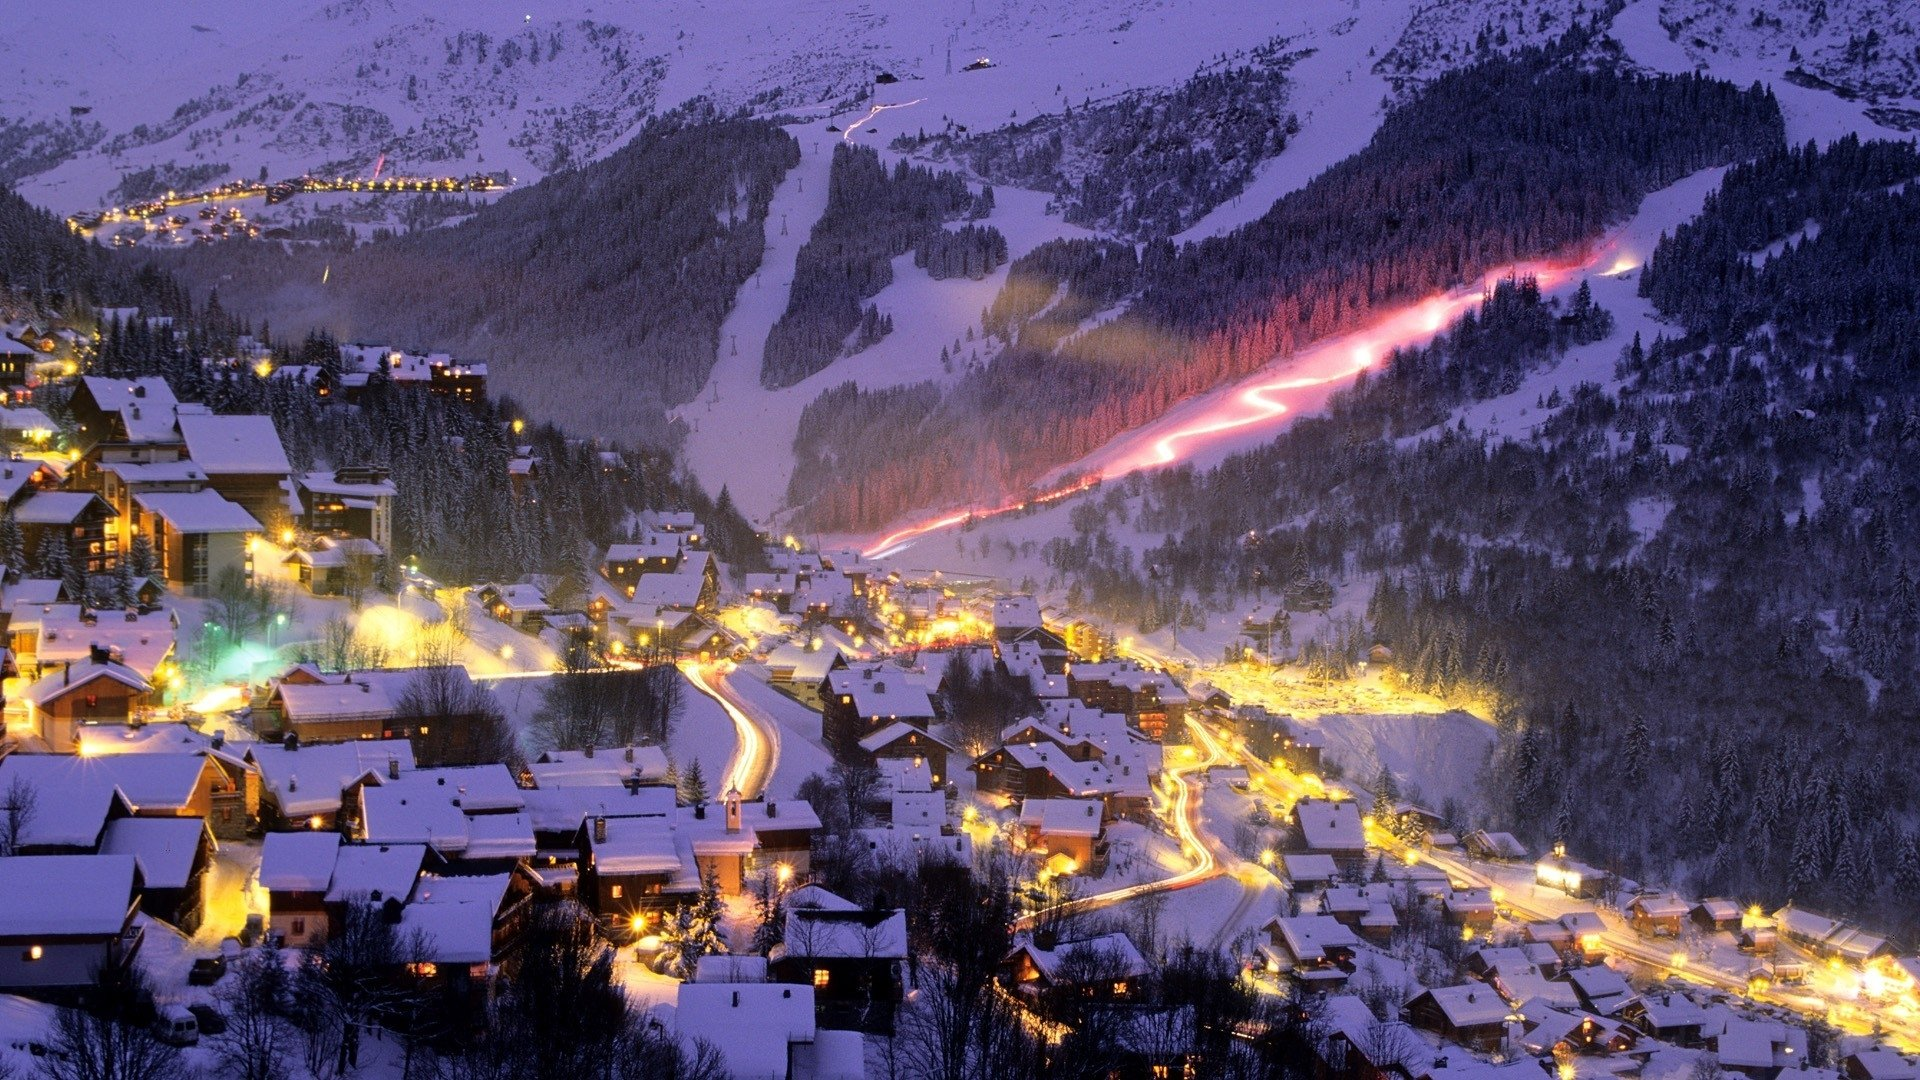 resort sports ski snowboard mountains nature slopes light timelapse 1920x1080